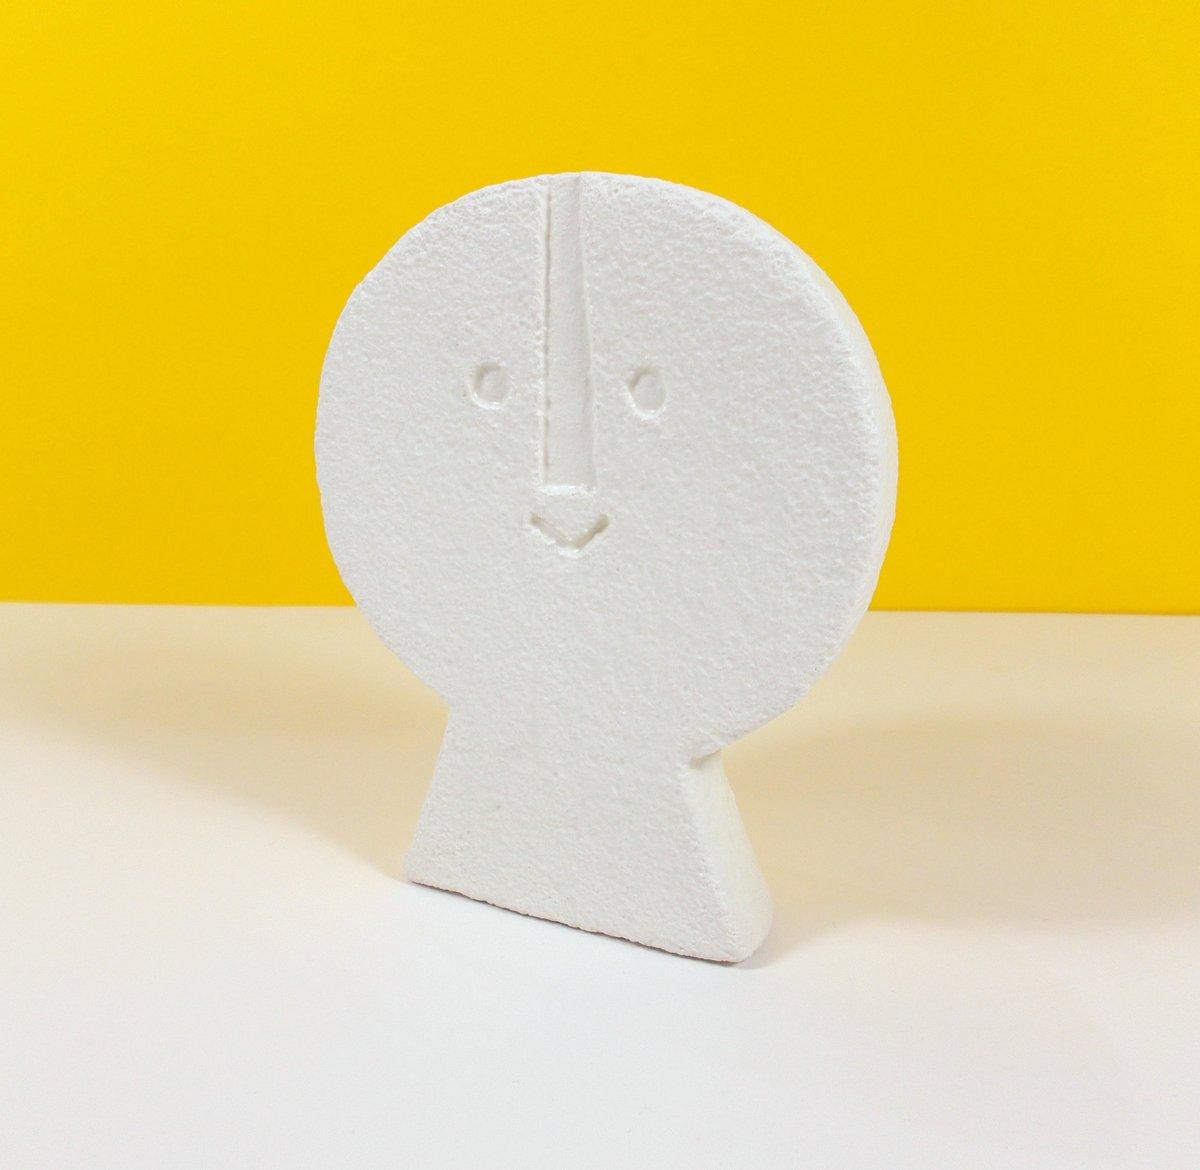 Image of Medium Head - Flat Front - MH05